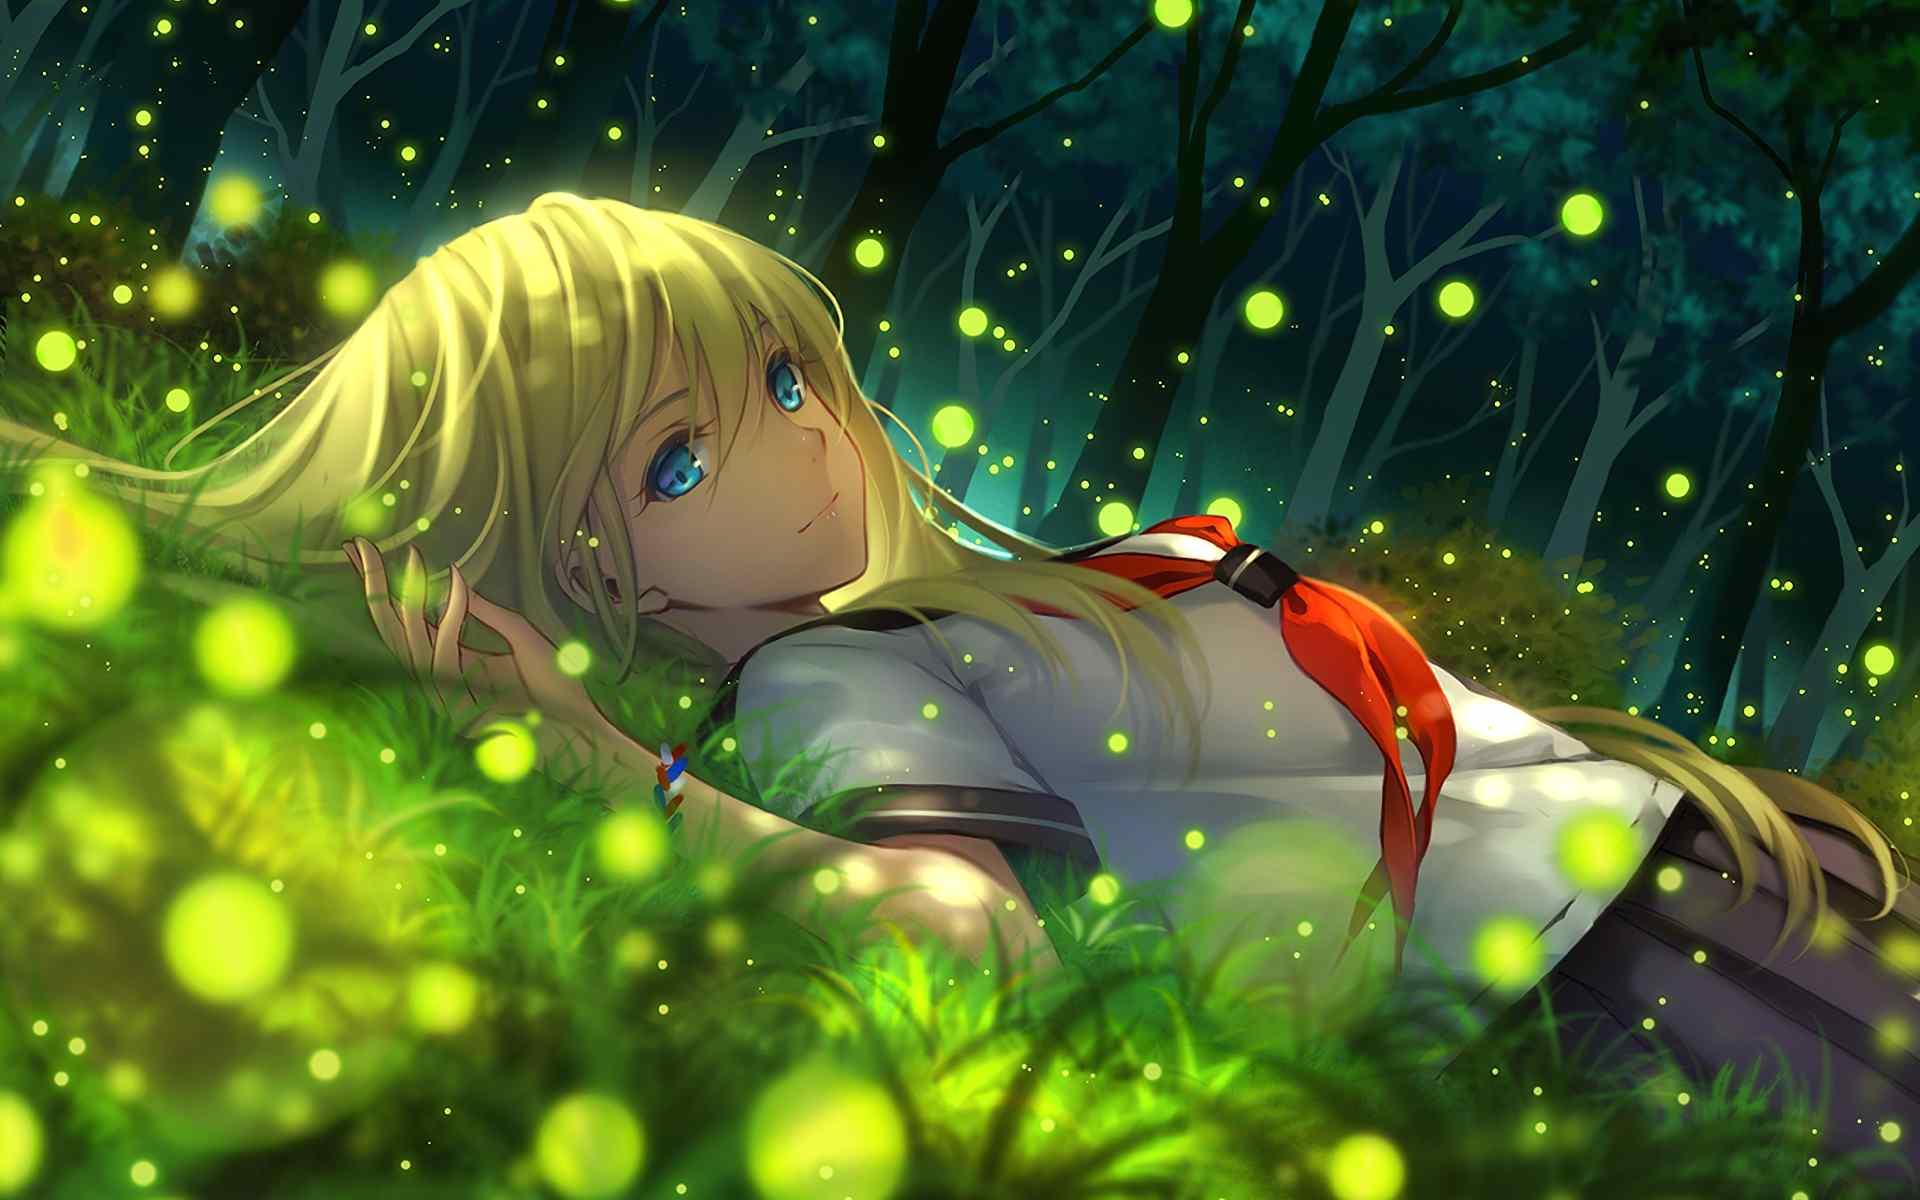 Illustration Anime Grass Green Underwater Jungle Everlasting Summer Girl Screenshot Habitat Natural Environment Computer Wallpaper